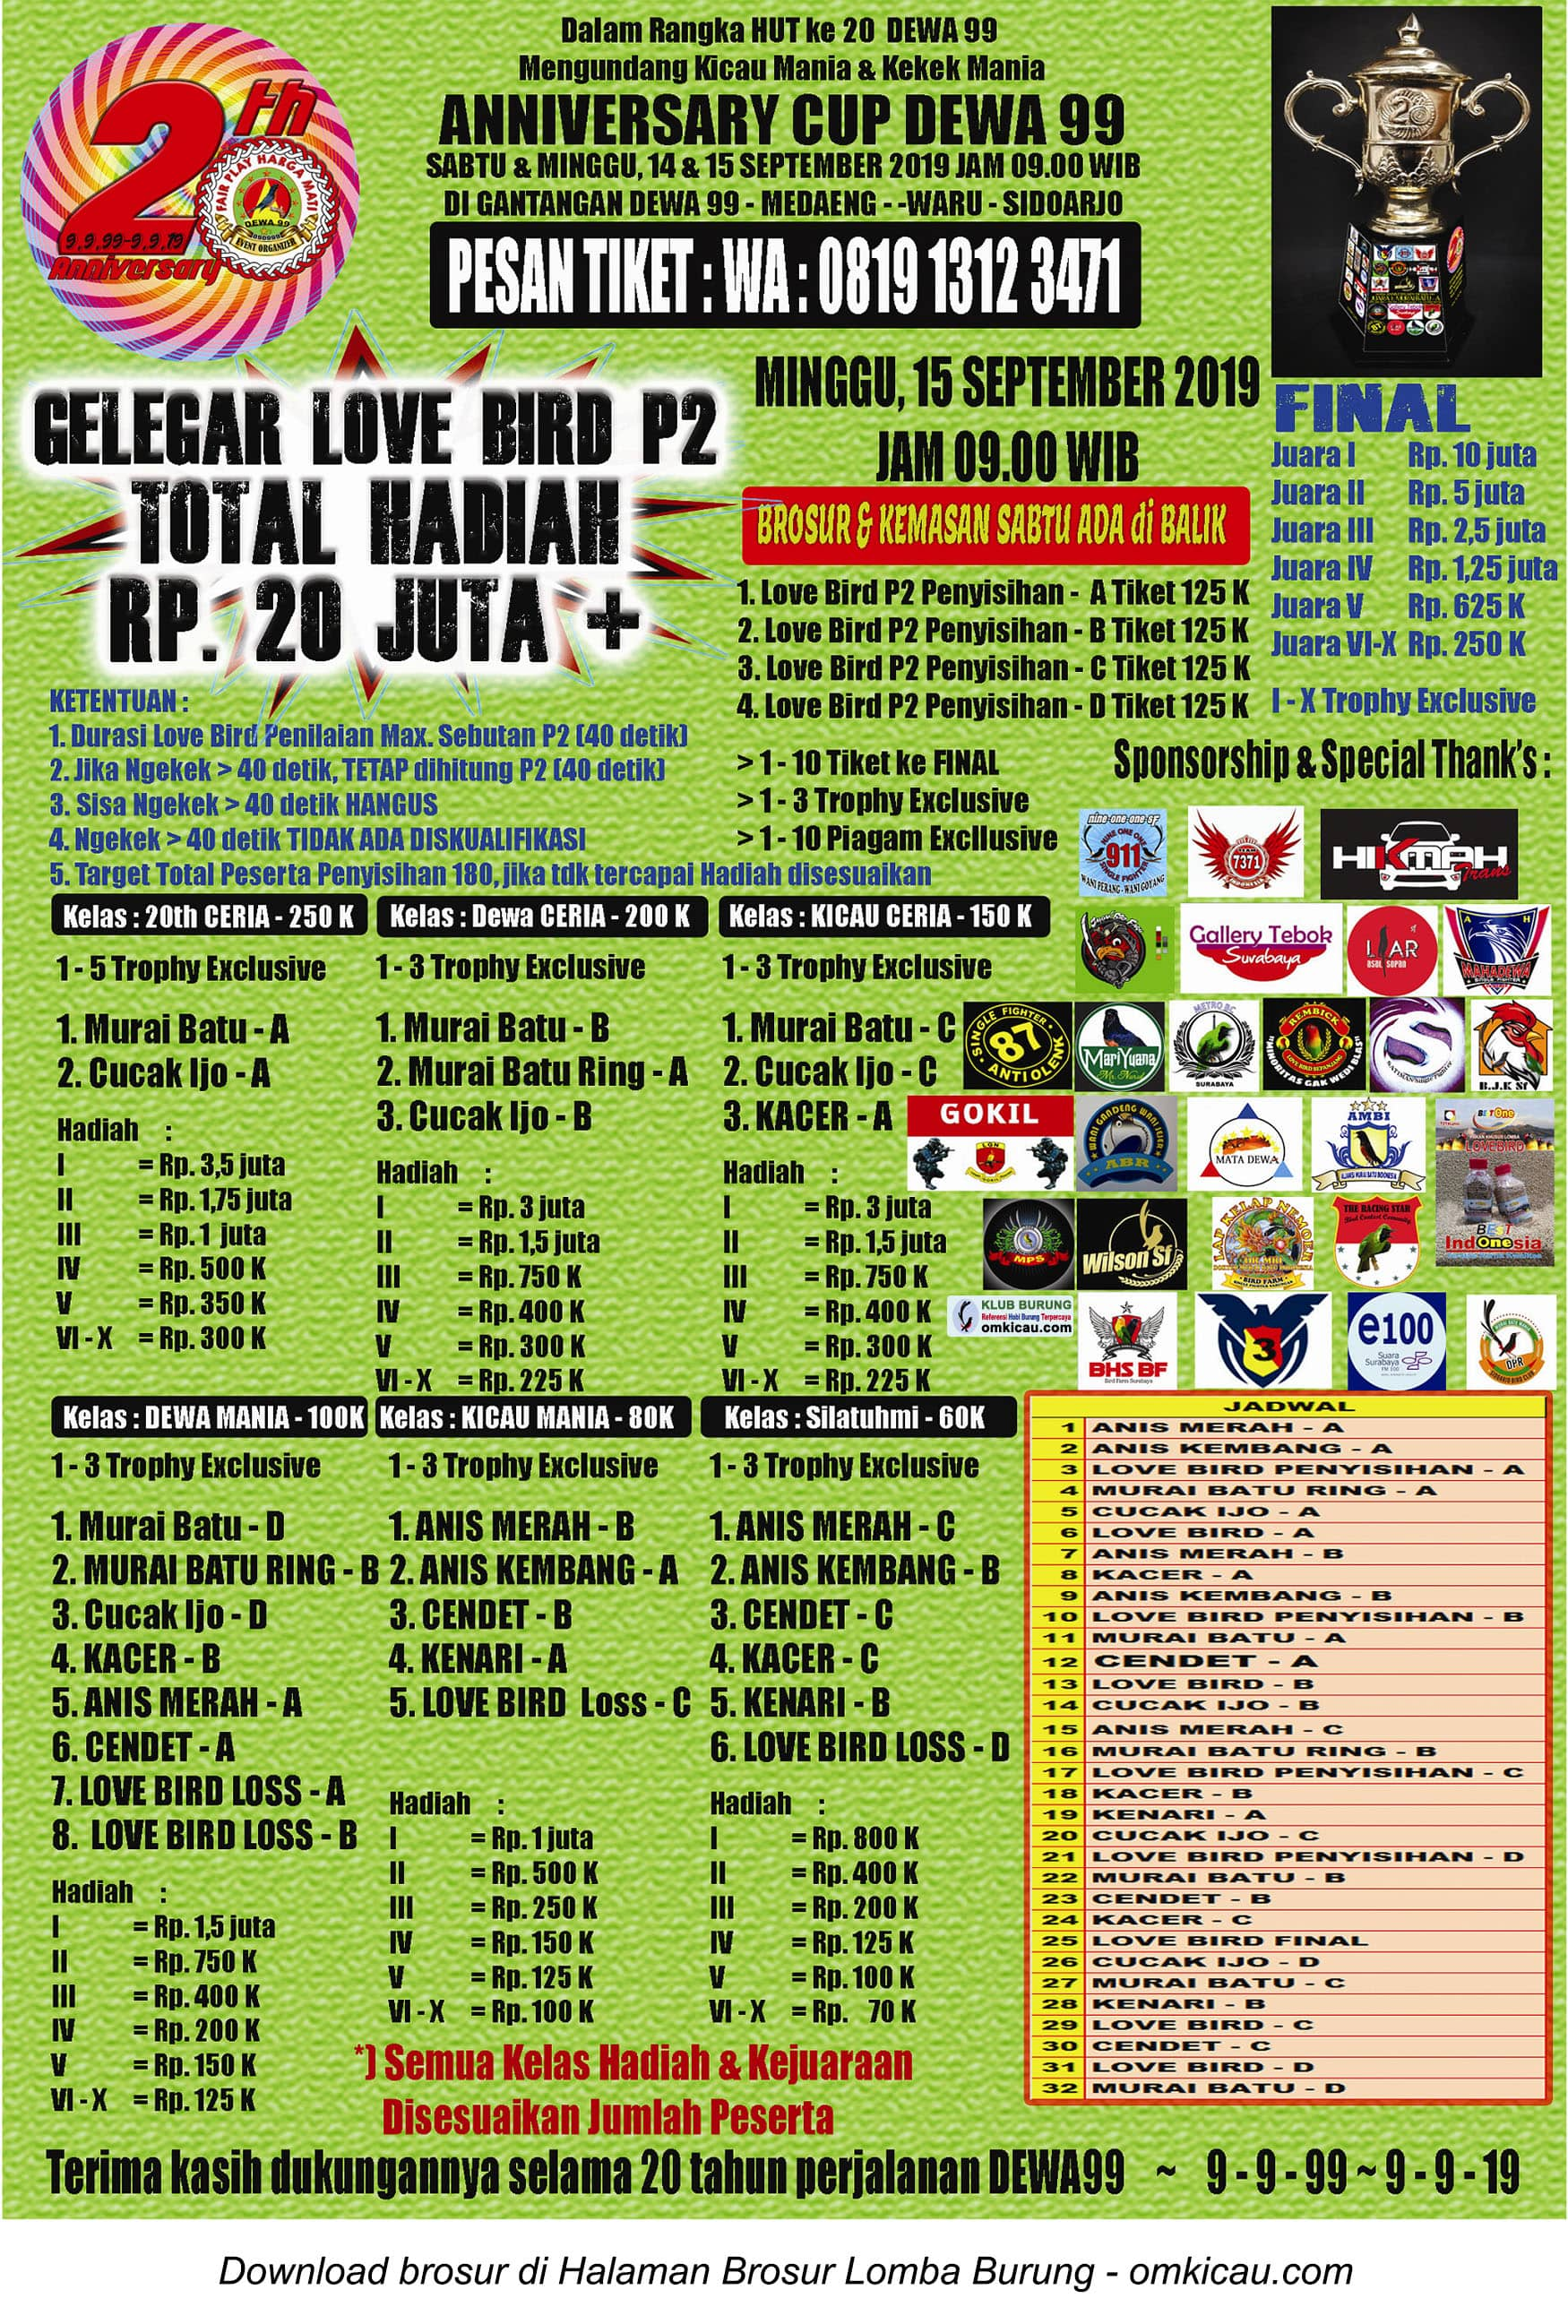 Anniversary Cup Dewa 99